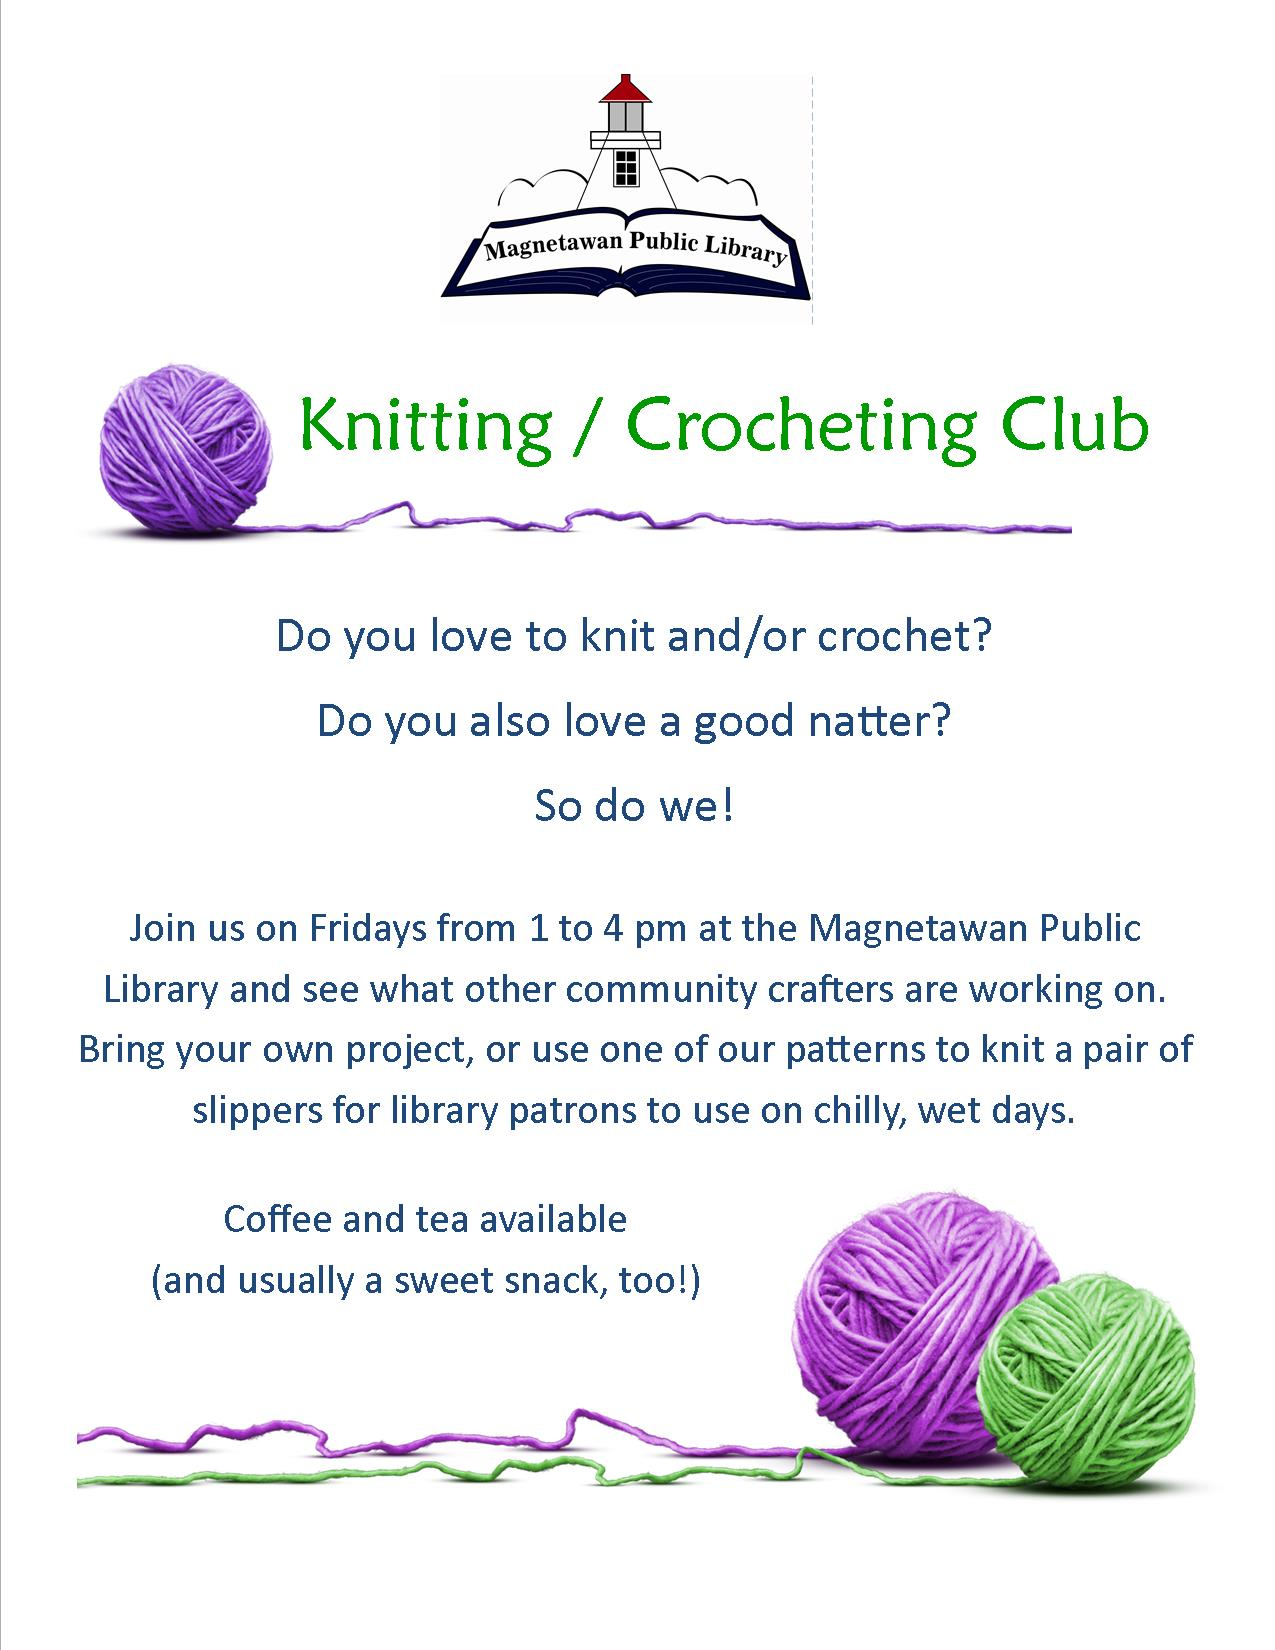 Poster: Knitting/Crocheting Club